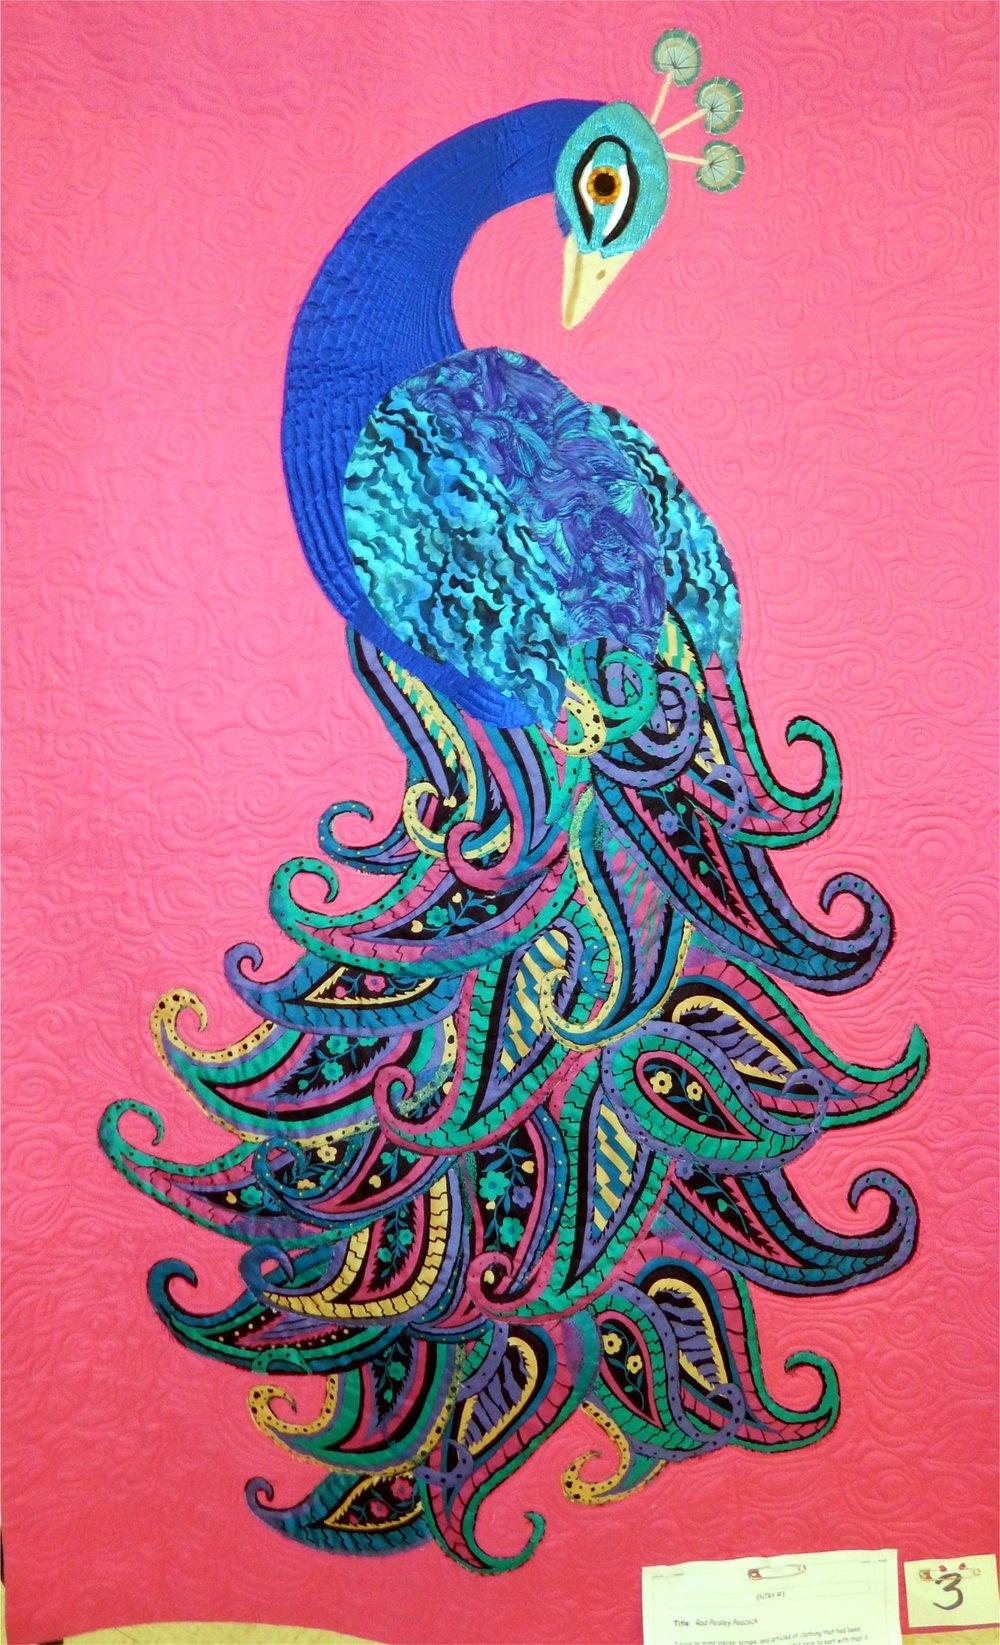 Rad Paisley Peacock